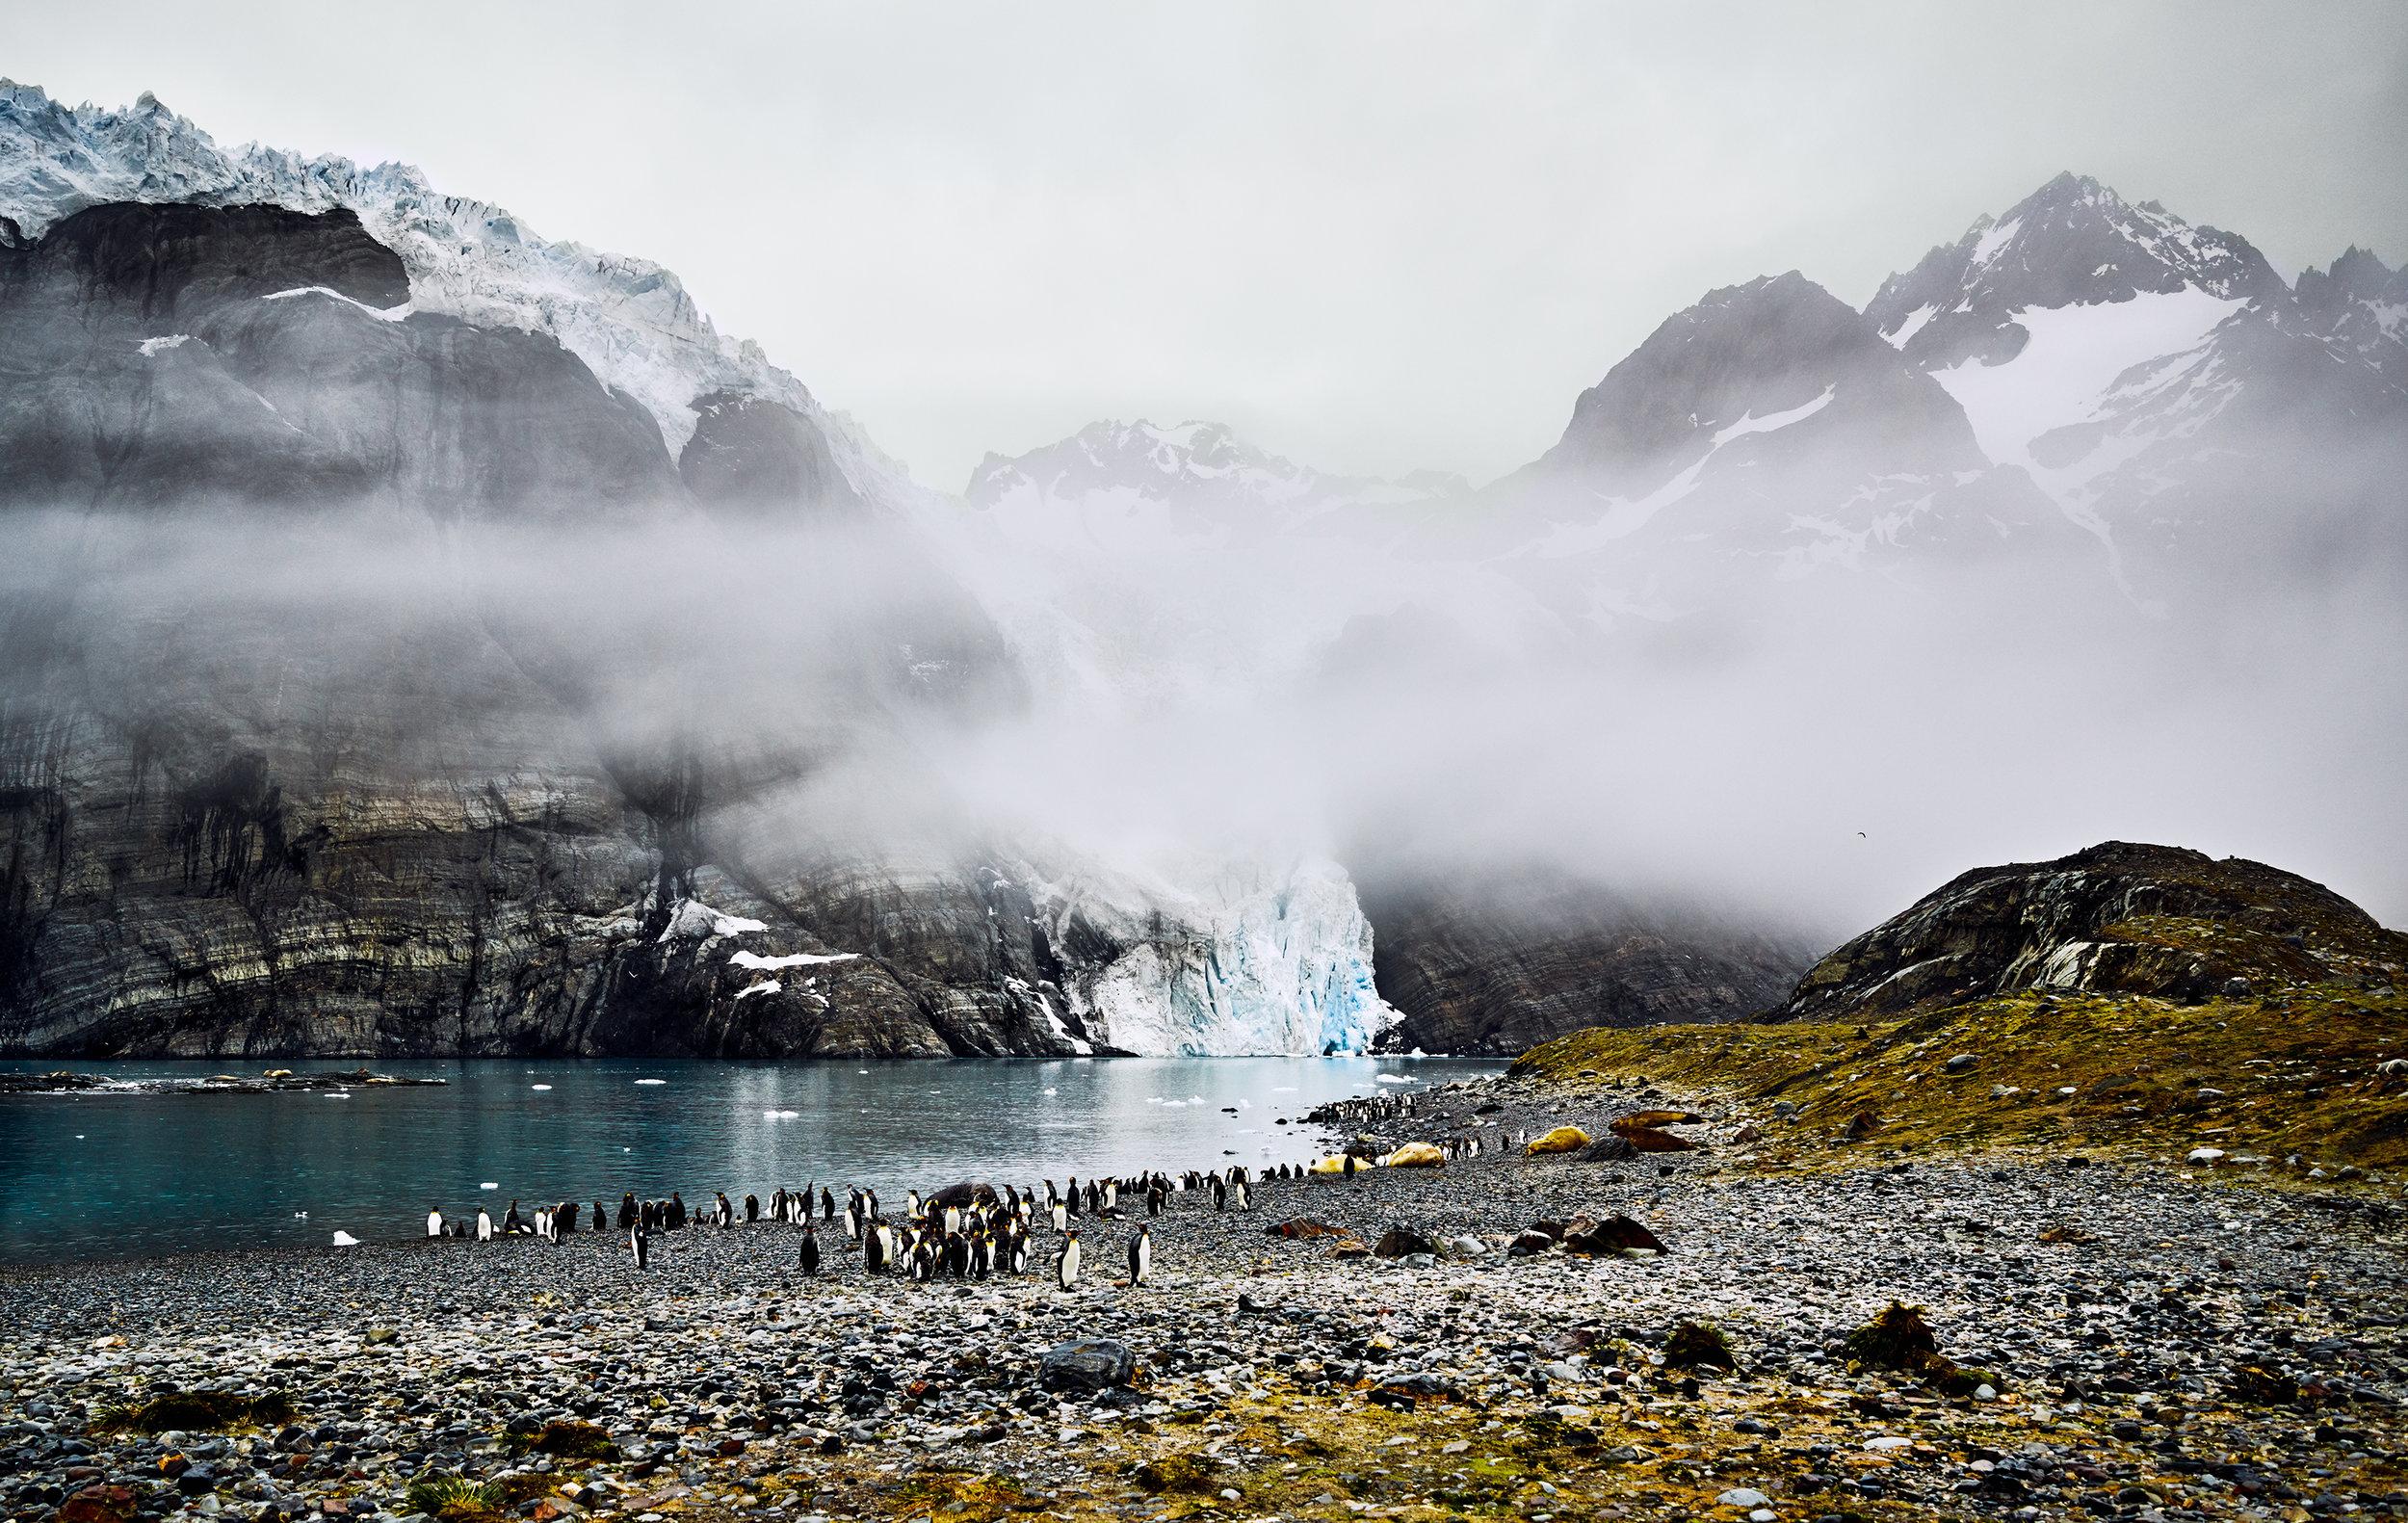 JPEG (8-bit)-16_1108-Antarctica-CF001751.jpg